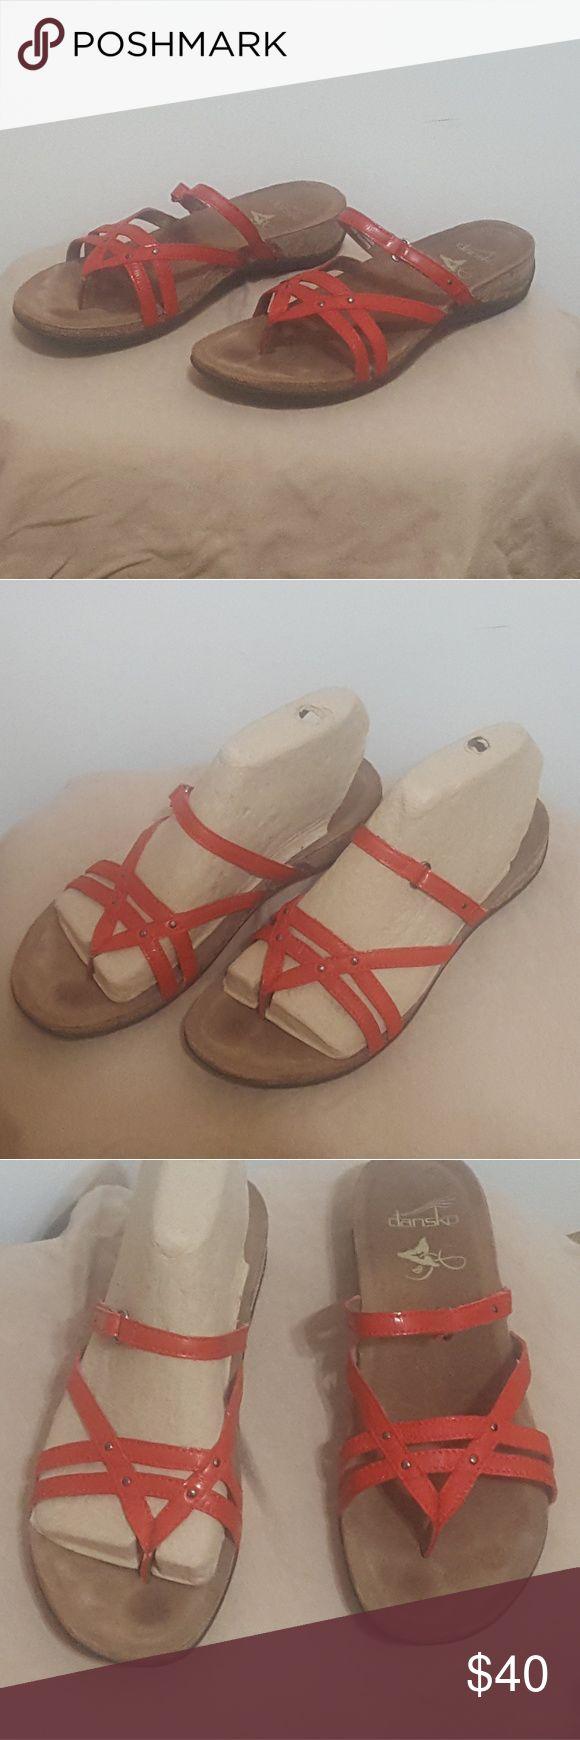 flat red sandal Flat red sandal by Dansko. Dansko never goes on sale! Rarely worn. Dansko Shoes Sandals